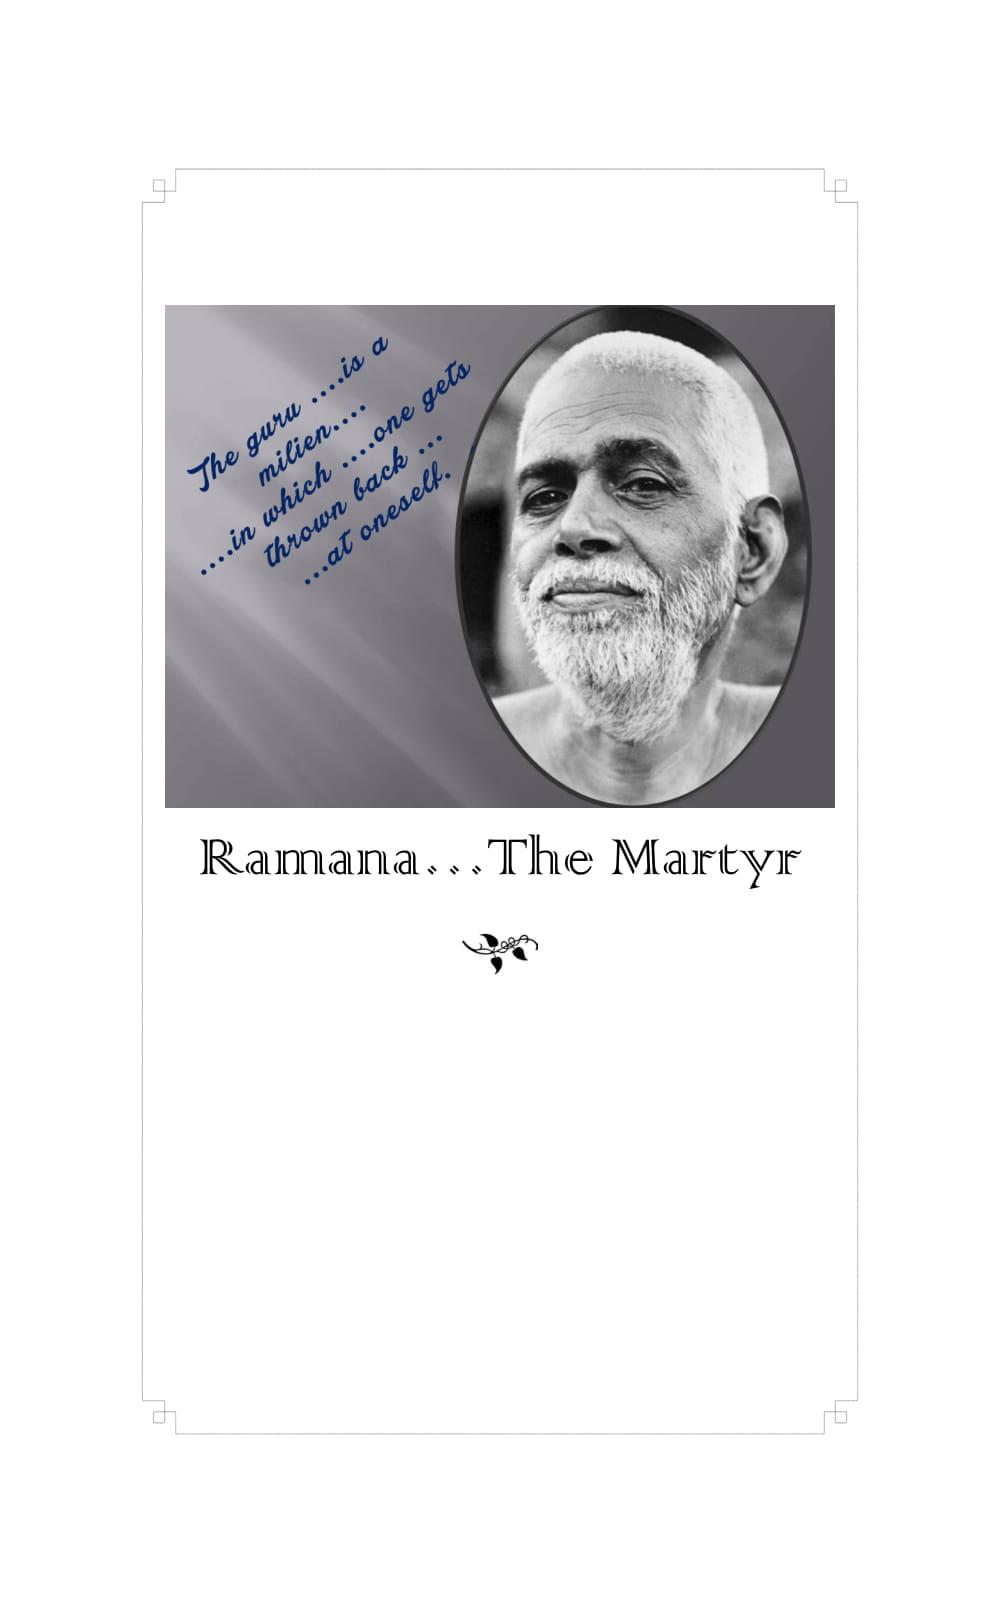 Musings-of-the-Awakening-Soul-Book-By-Dr-Pallavi-Kwatra-245.jpg